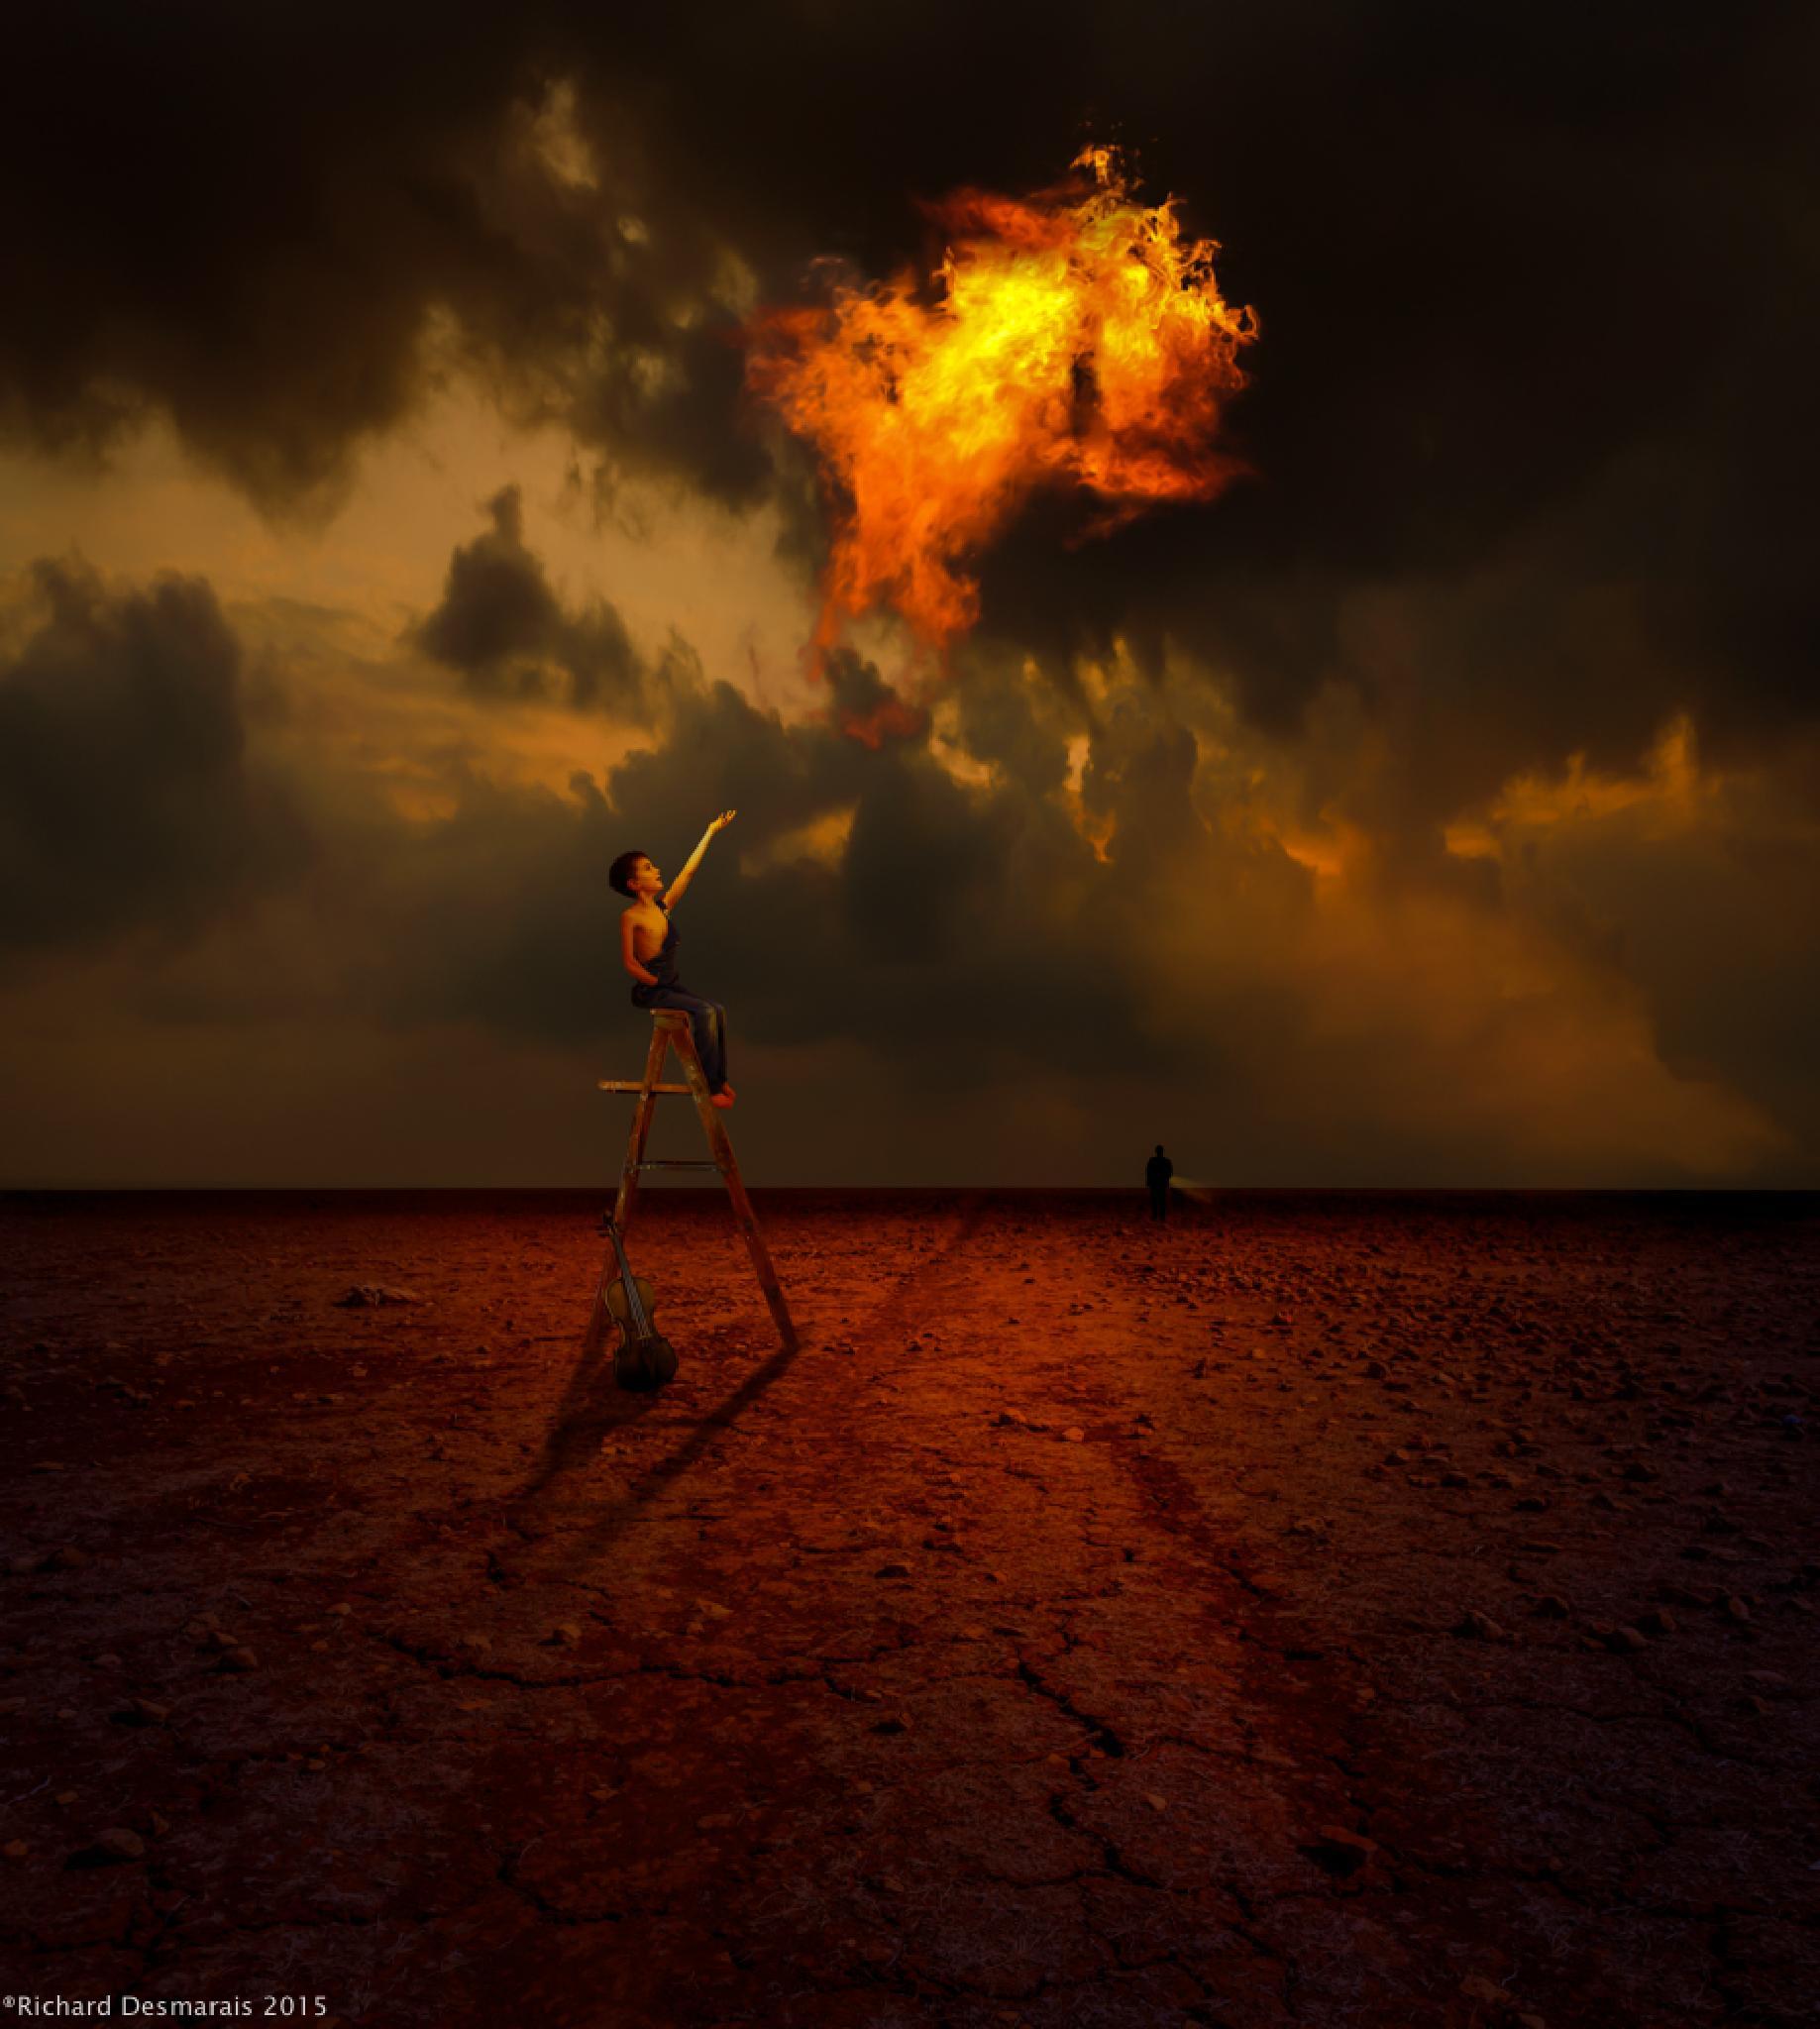 Fire Boy by Richard Desmarais